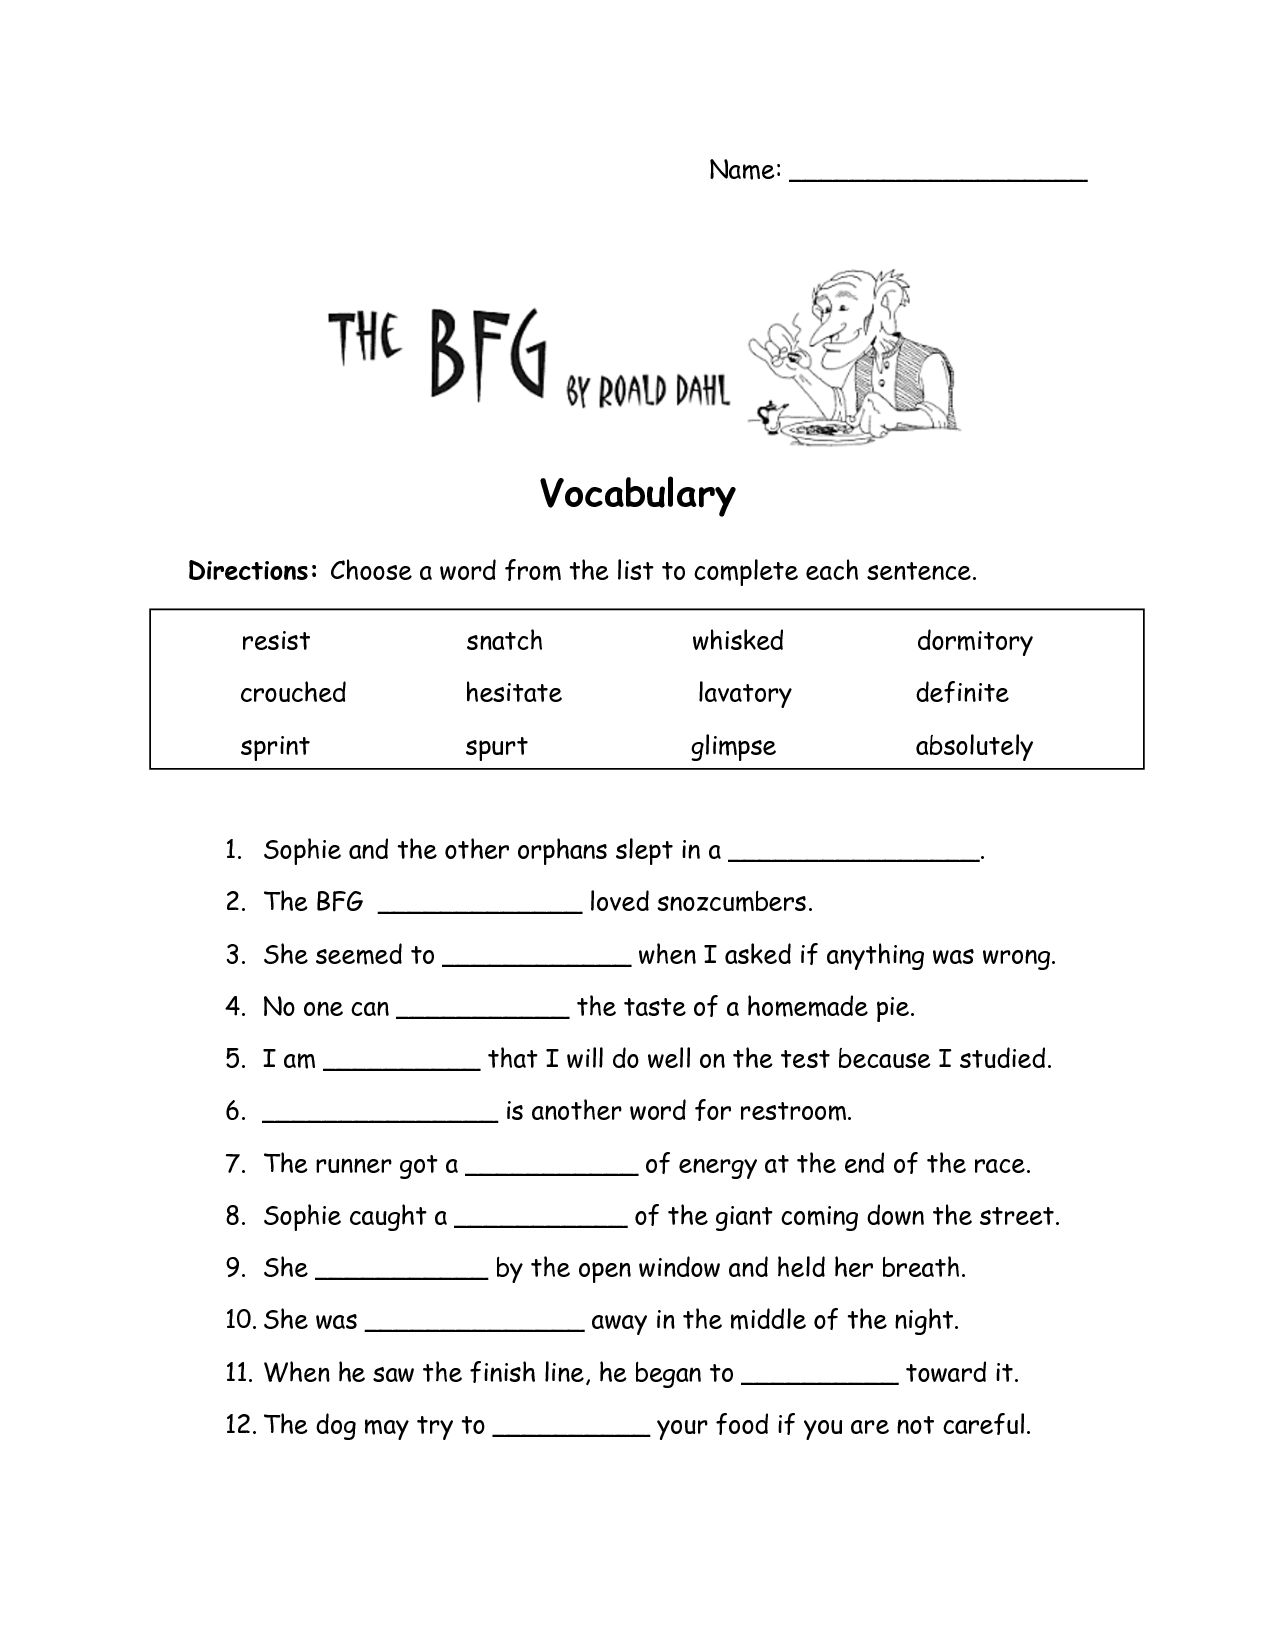 3rd Grade Vocabulary Worksheets Vocabulary Worksheets Middle School Grammar Worksheets The Bfg Book [ 1650 x 1275 Pixel ]